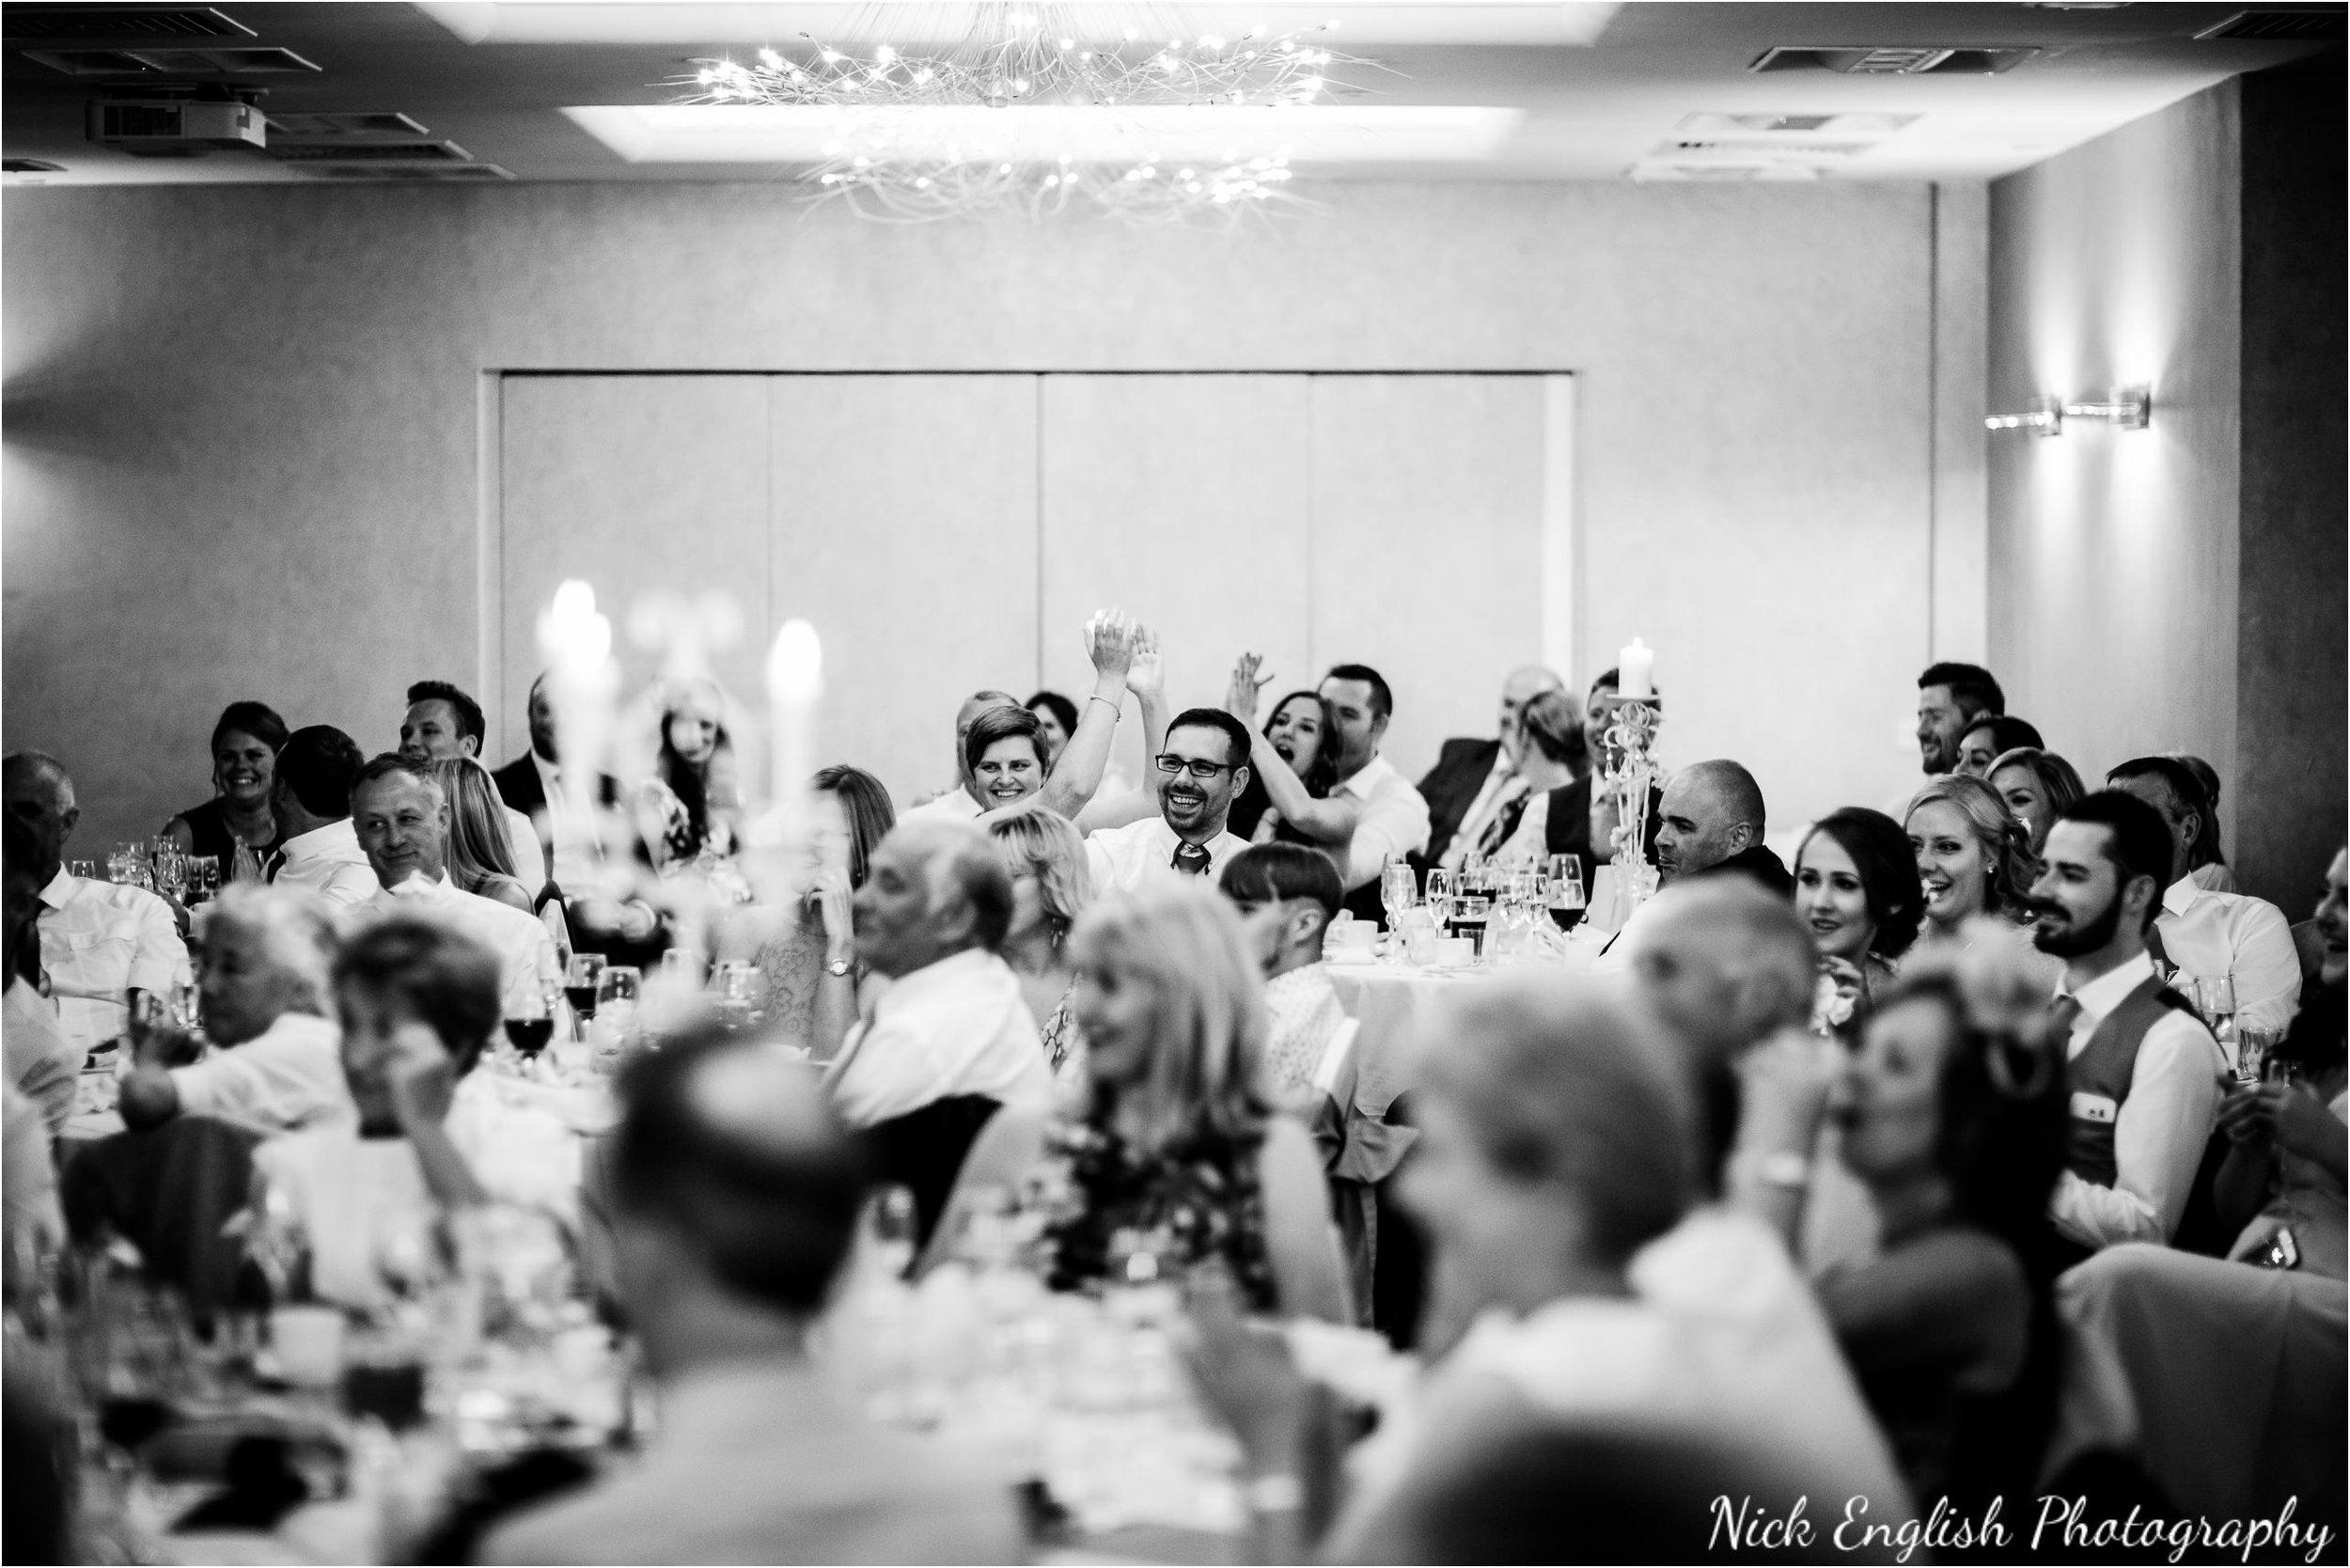 Emily David Wedding Photographs at Barton Grange Preston by Nick English Photography 175jpg.jpeg